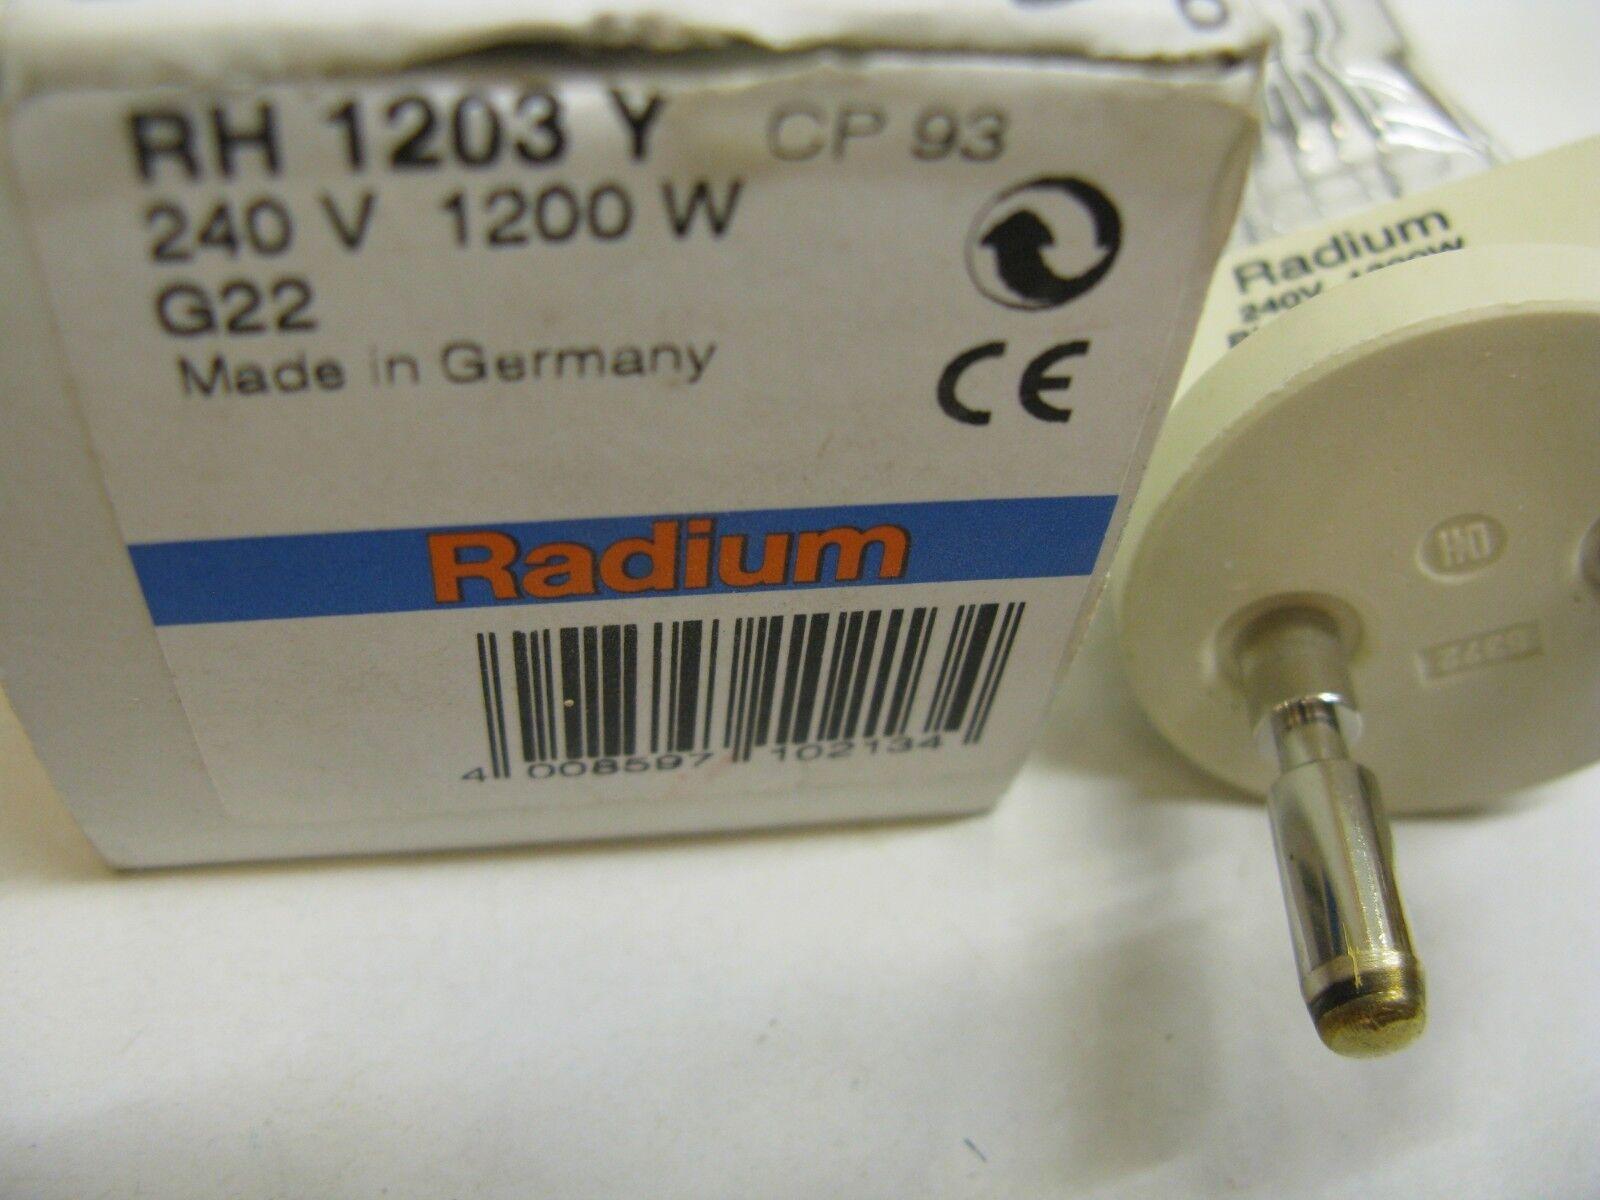 Radium RH 1203 1203 1203 Y CP 93 240V 1200W G22 single ended Lampada Alogena Lampadina  PJ25 215f88